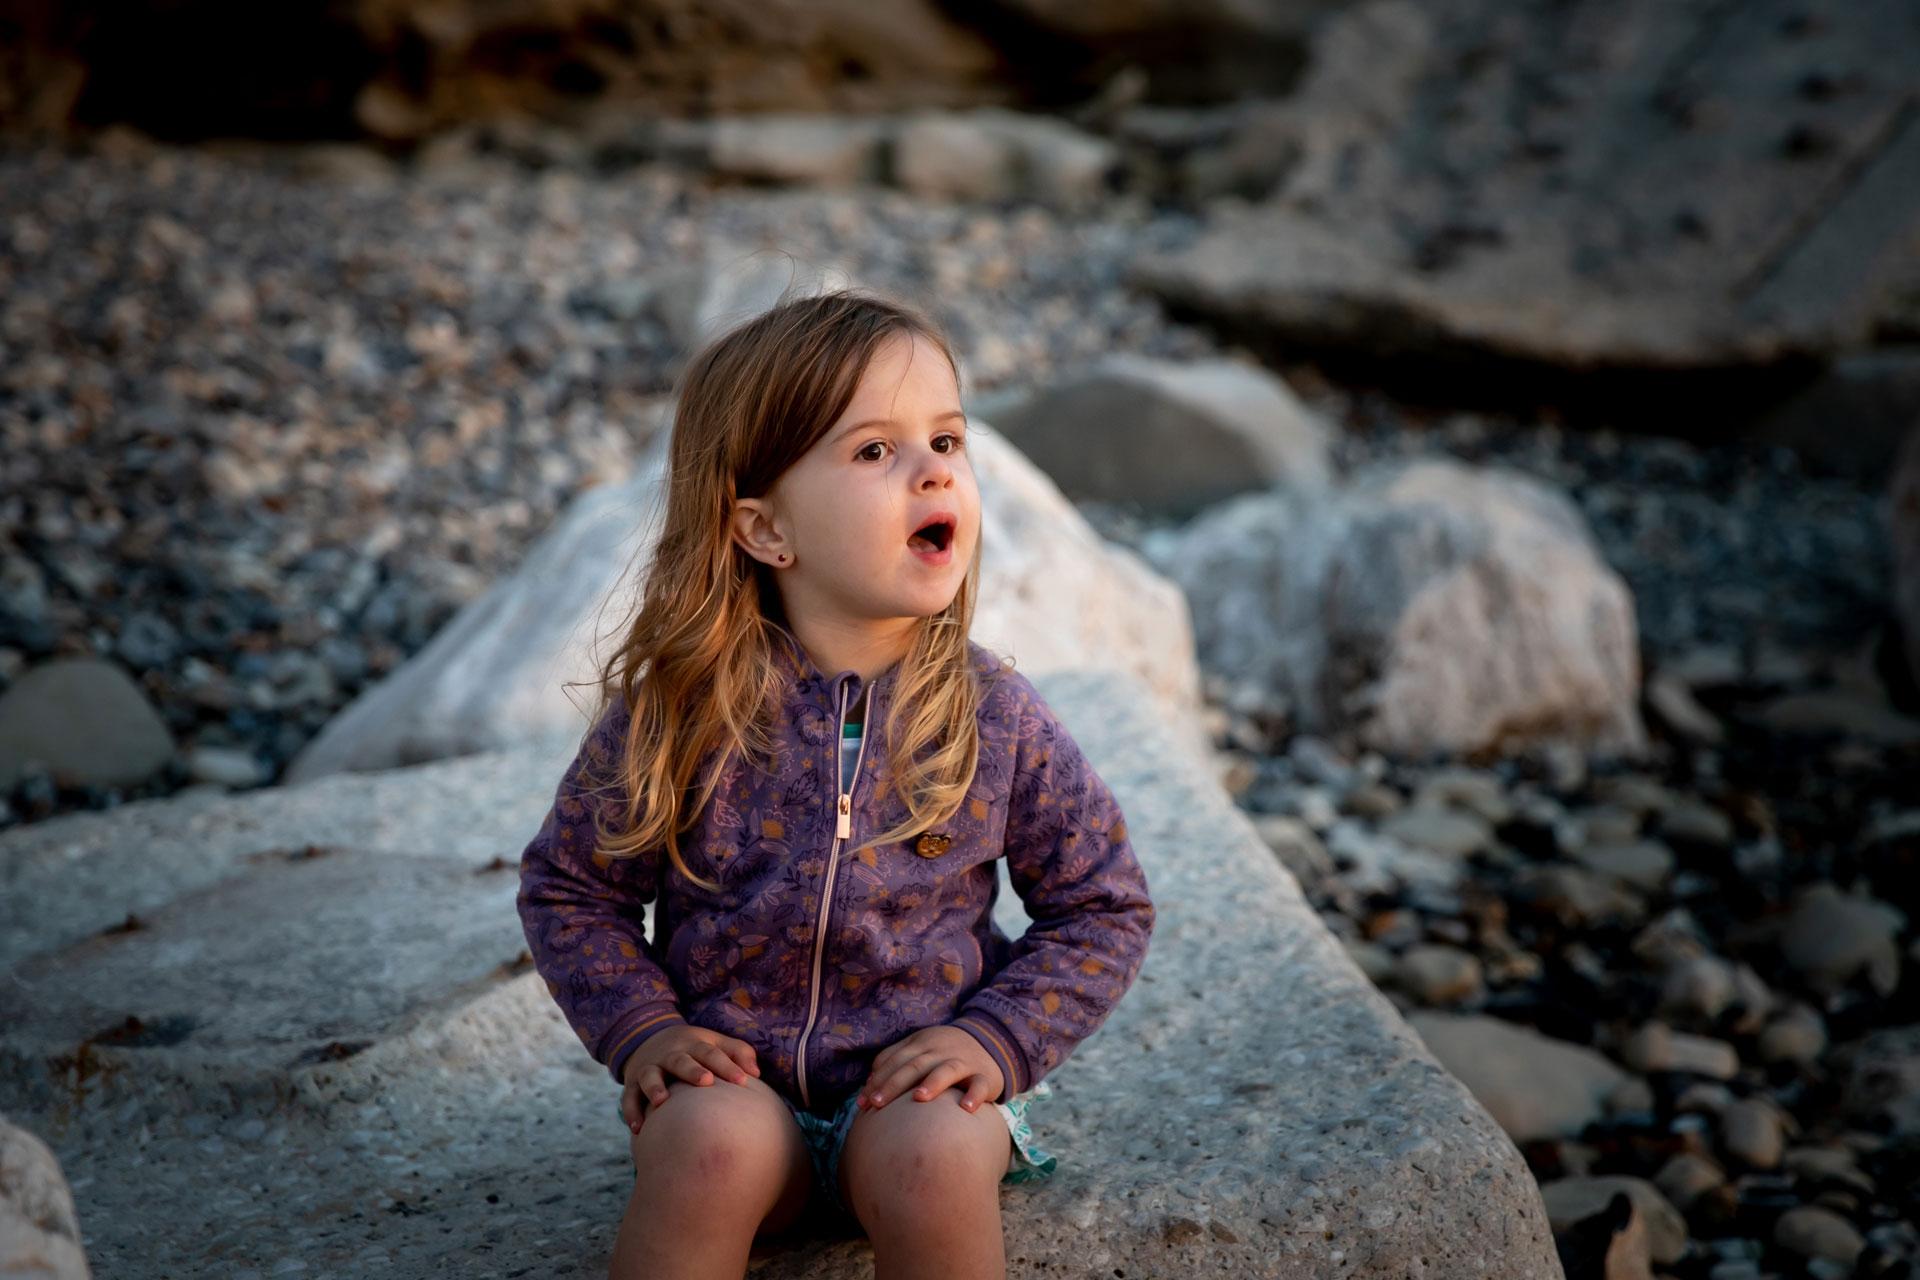 particuliers-portraits-famille-chauveau-mary-2020-095